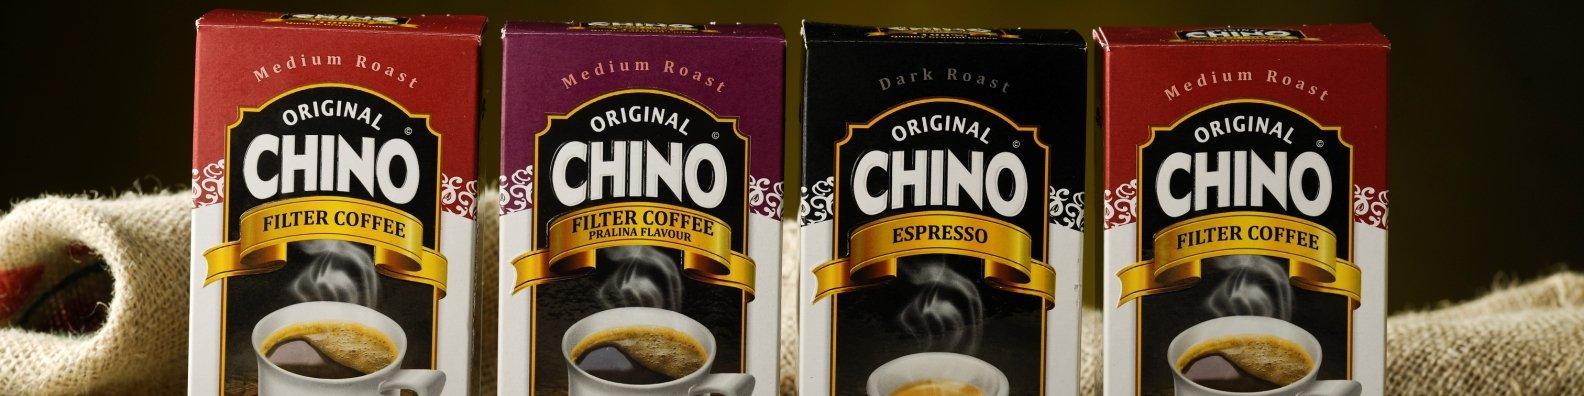 Original Chino Coffee products